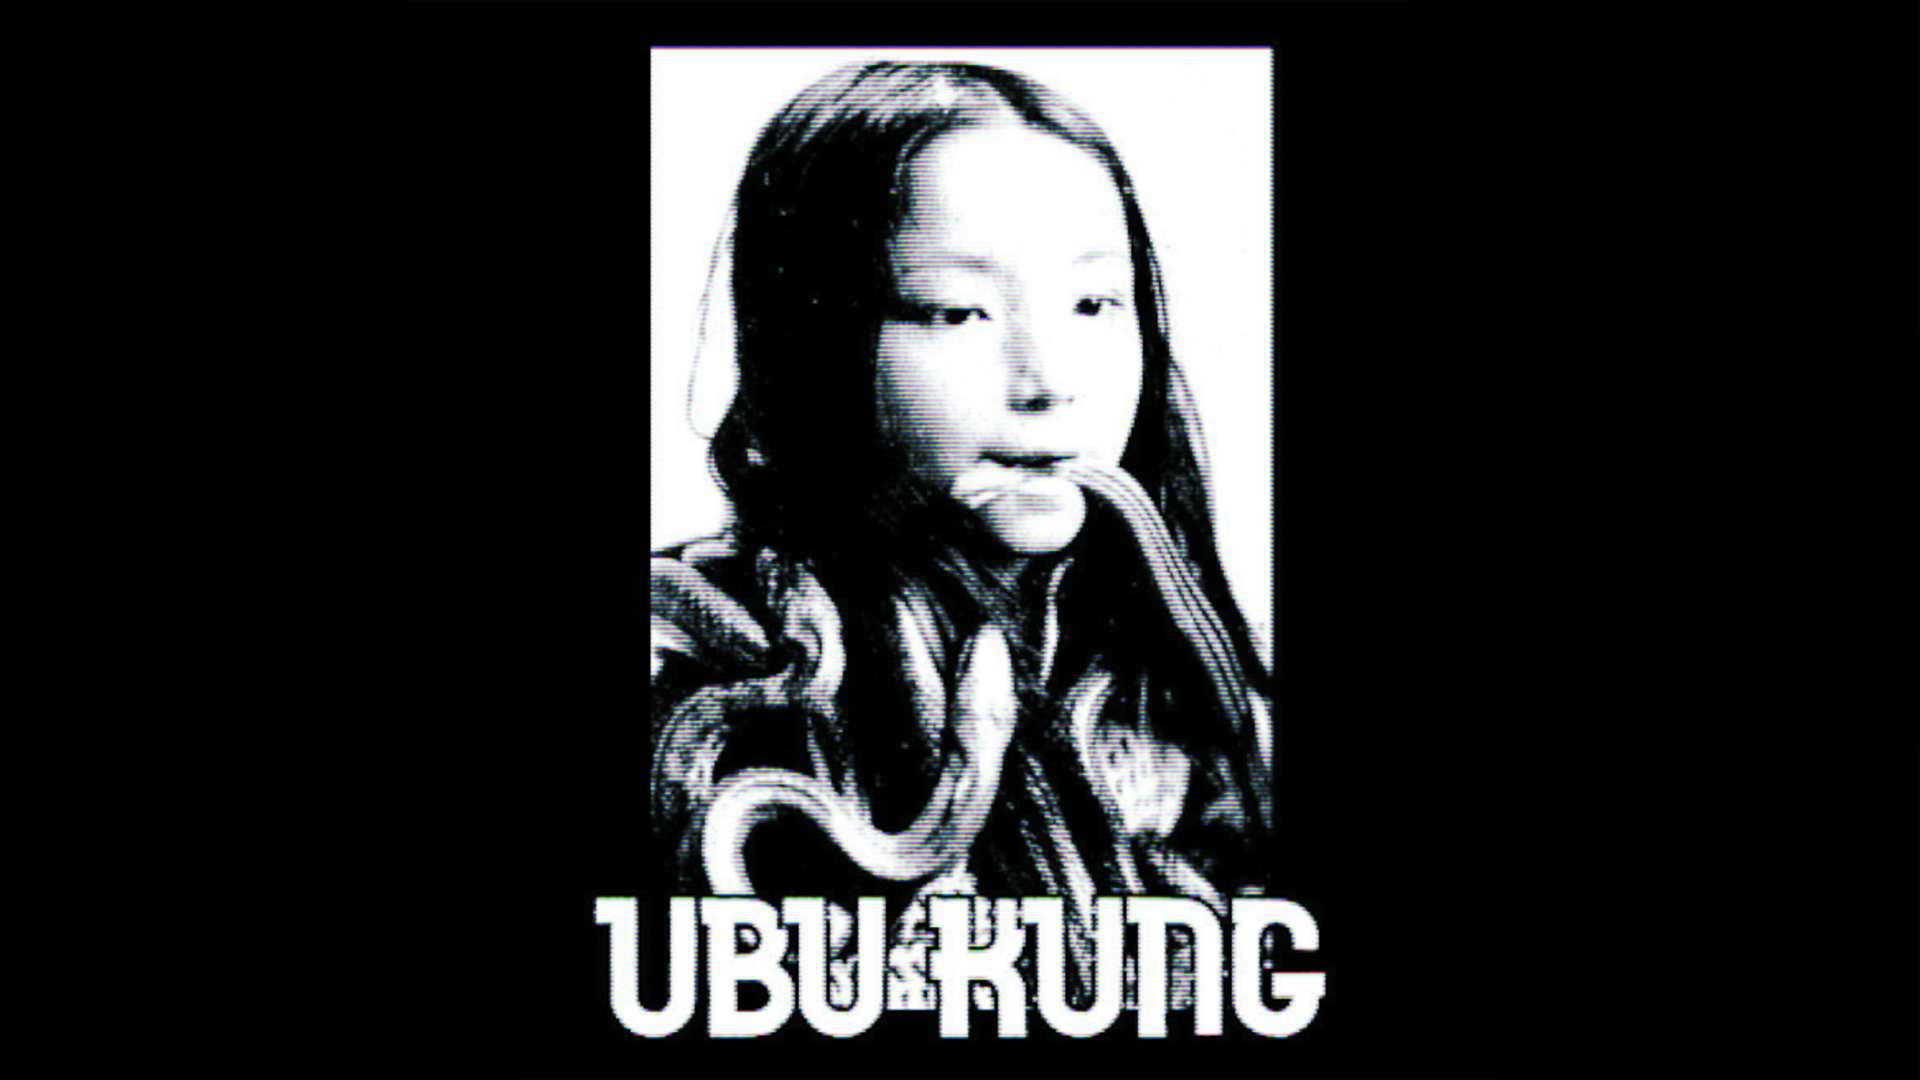 Ubu Kung Sound